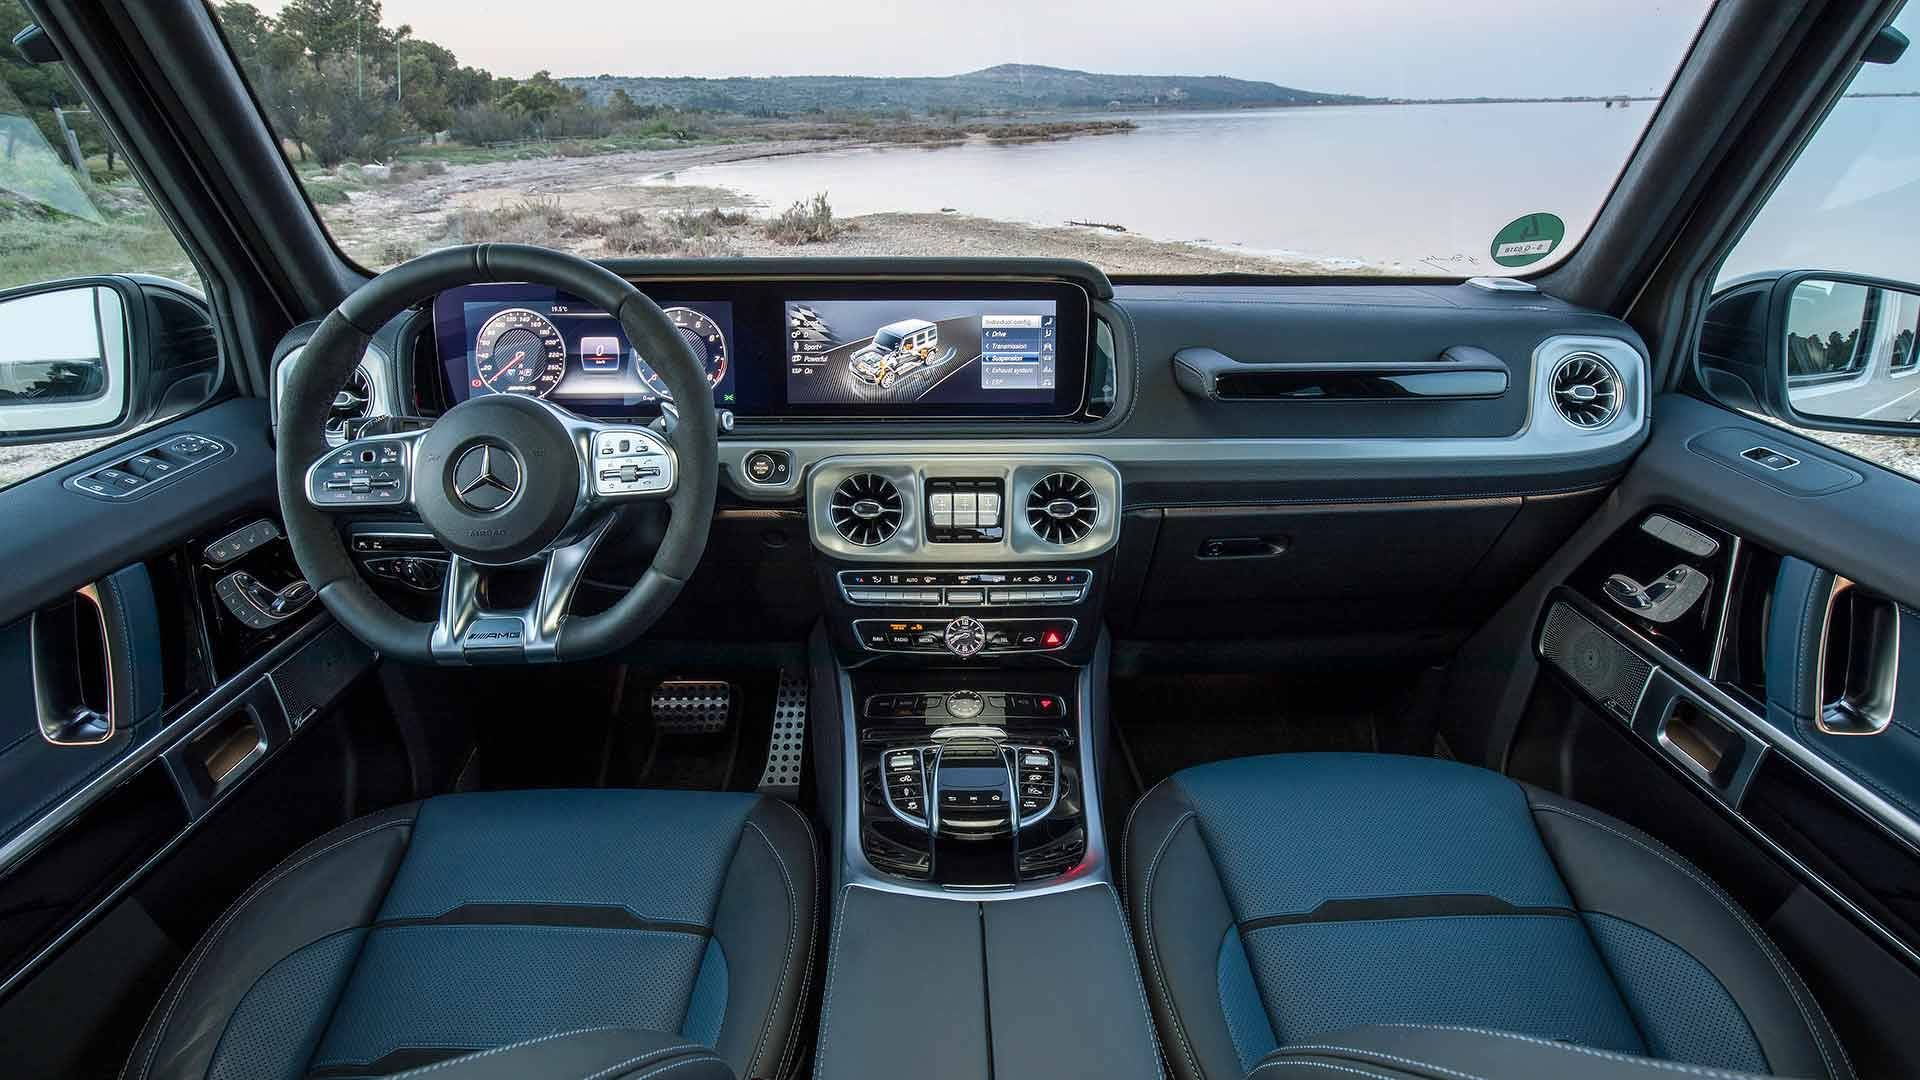 2019 Mercedes Amg G63 First Drive Motor1 Com Photos Mercedes